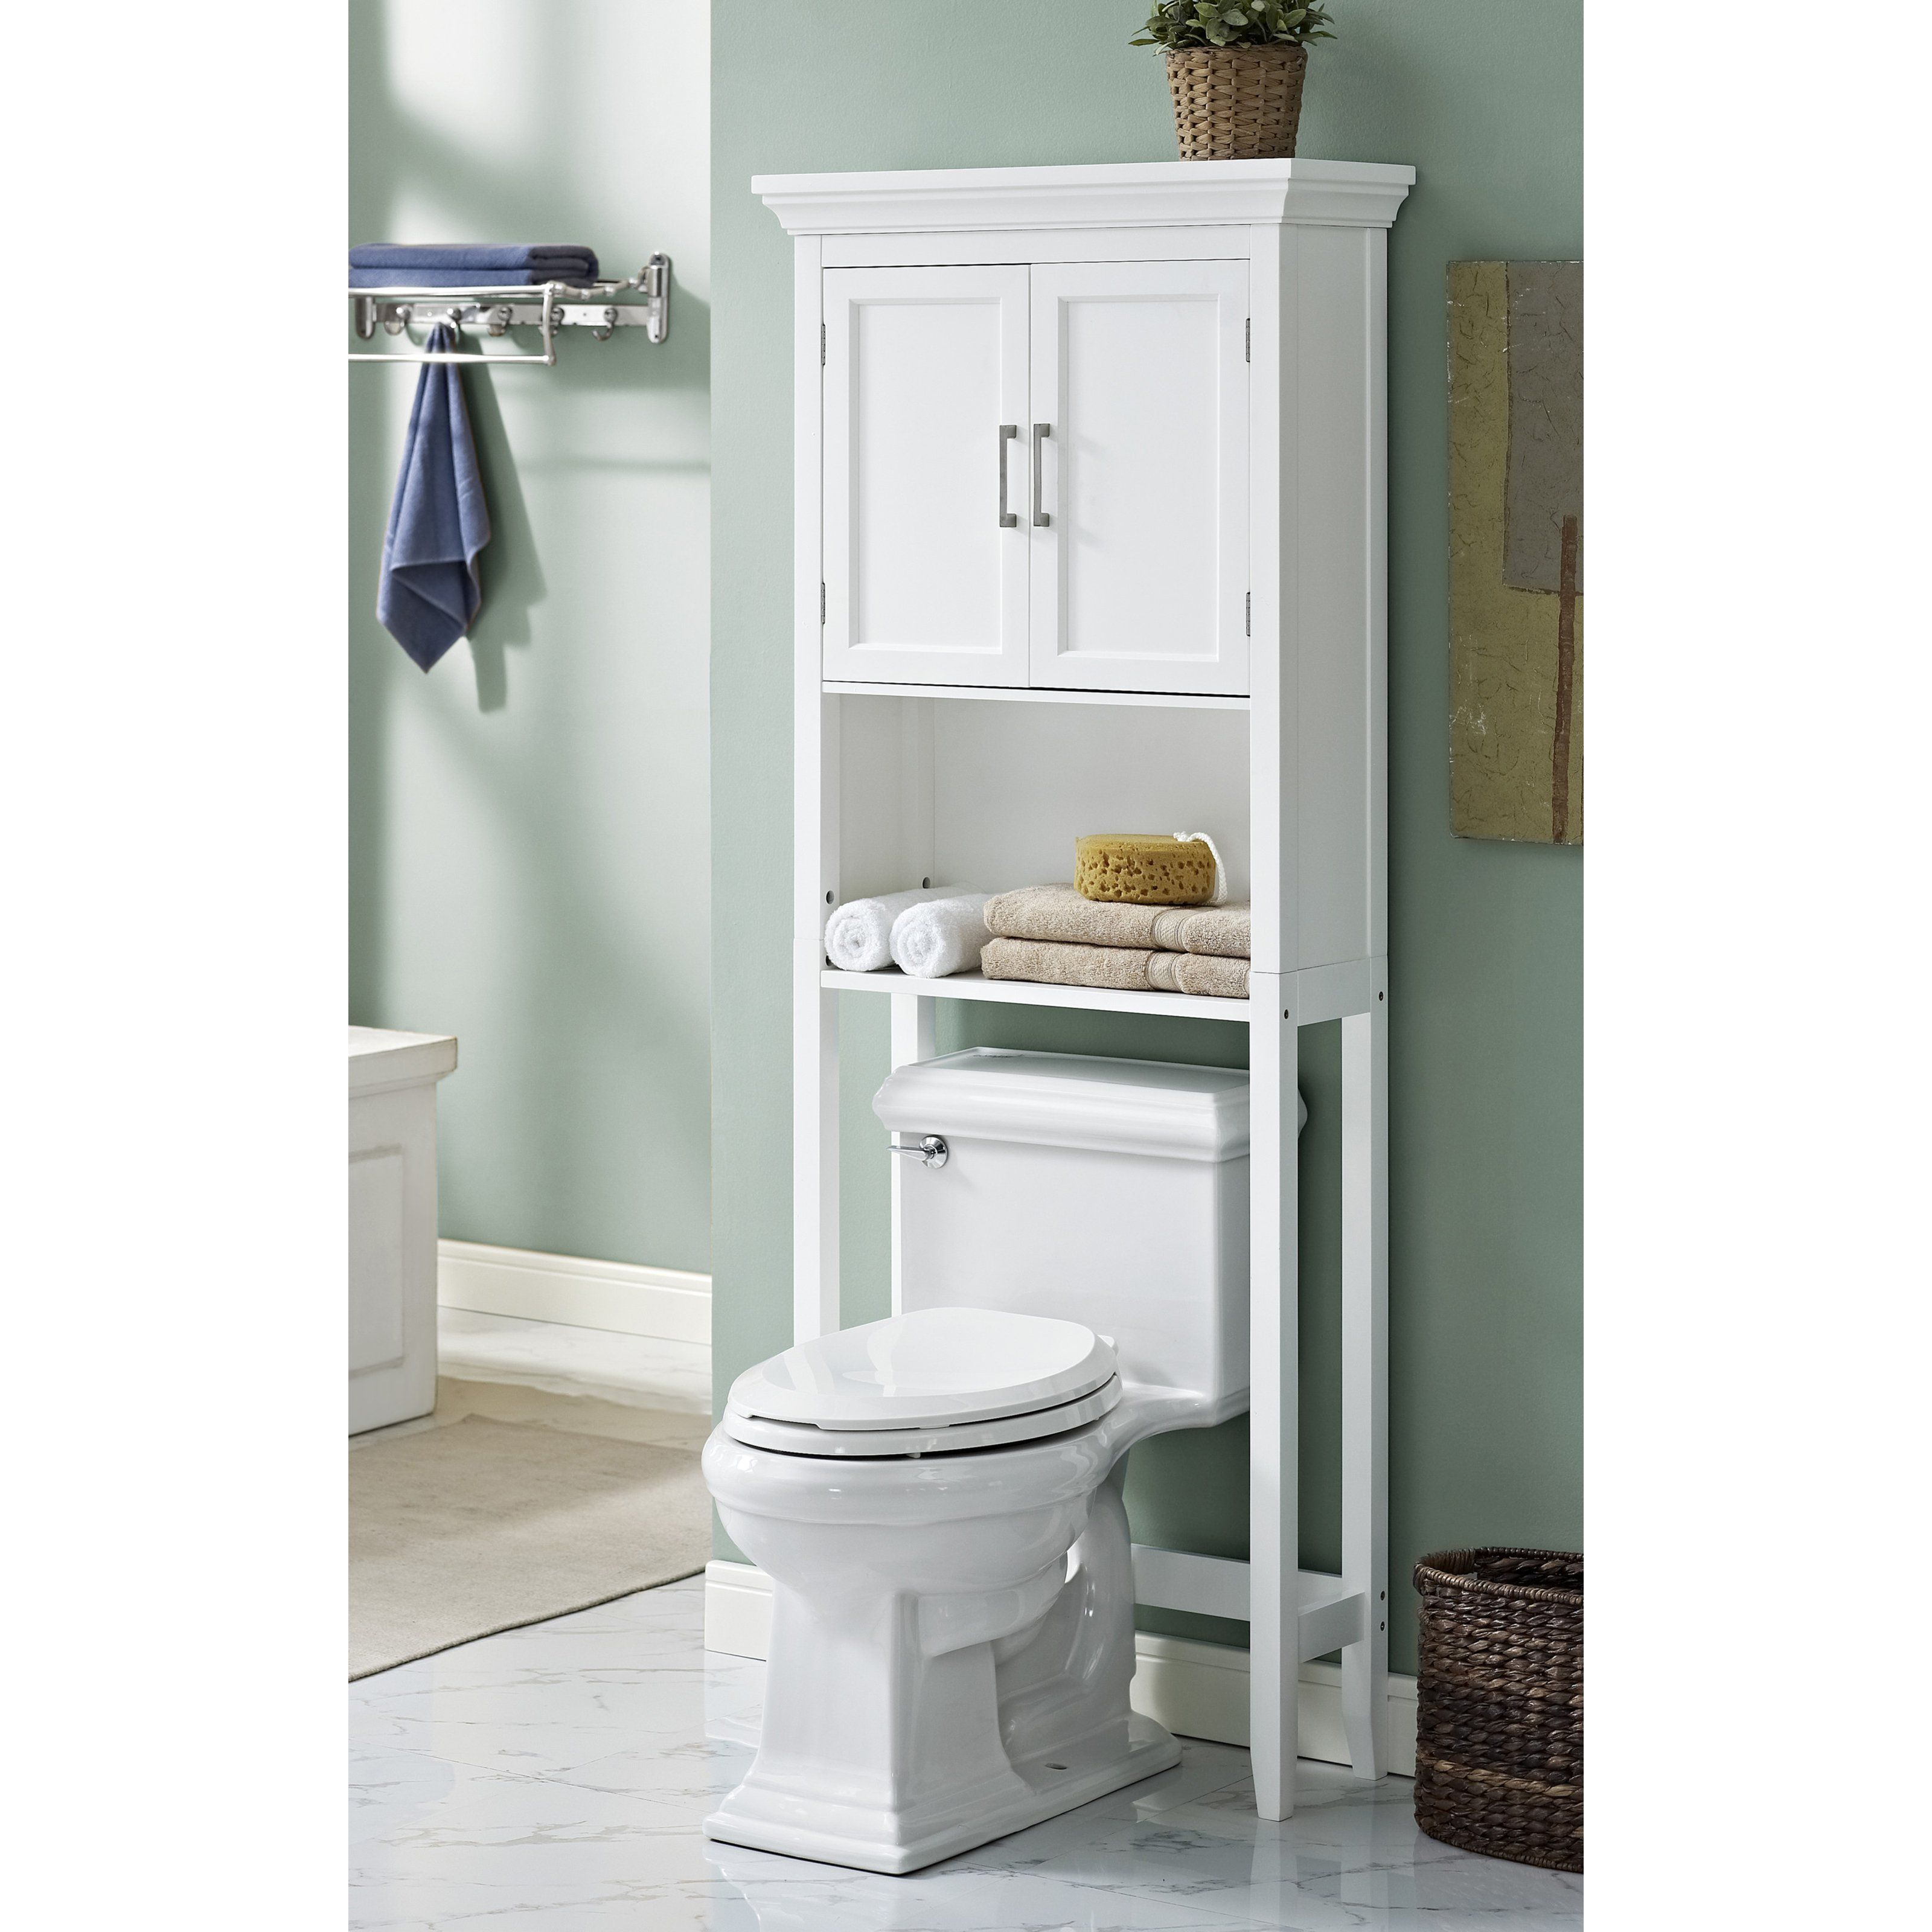 Simpli Home Avington Space Saver Bathroom Cabinet | from hayneedle ...